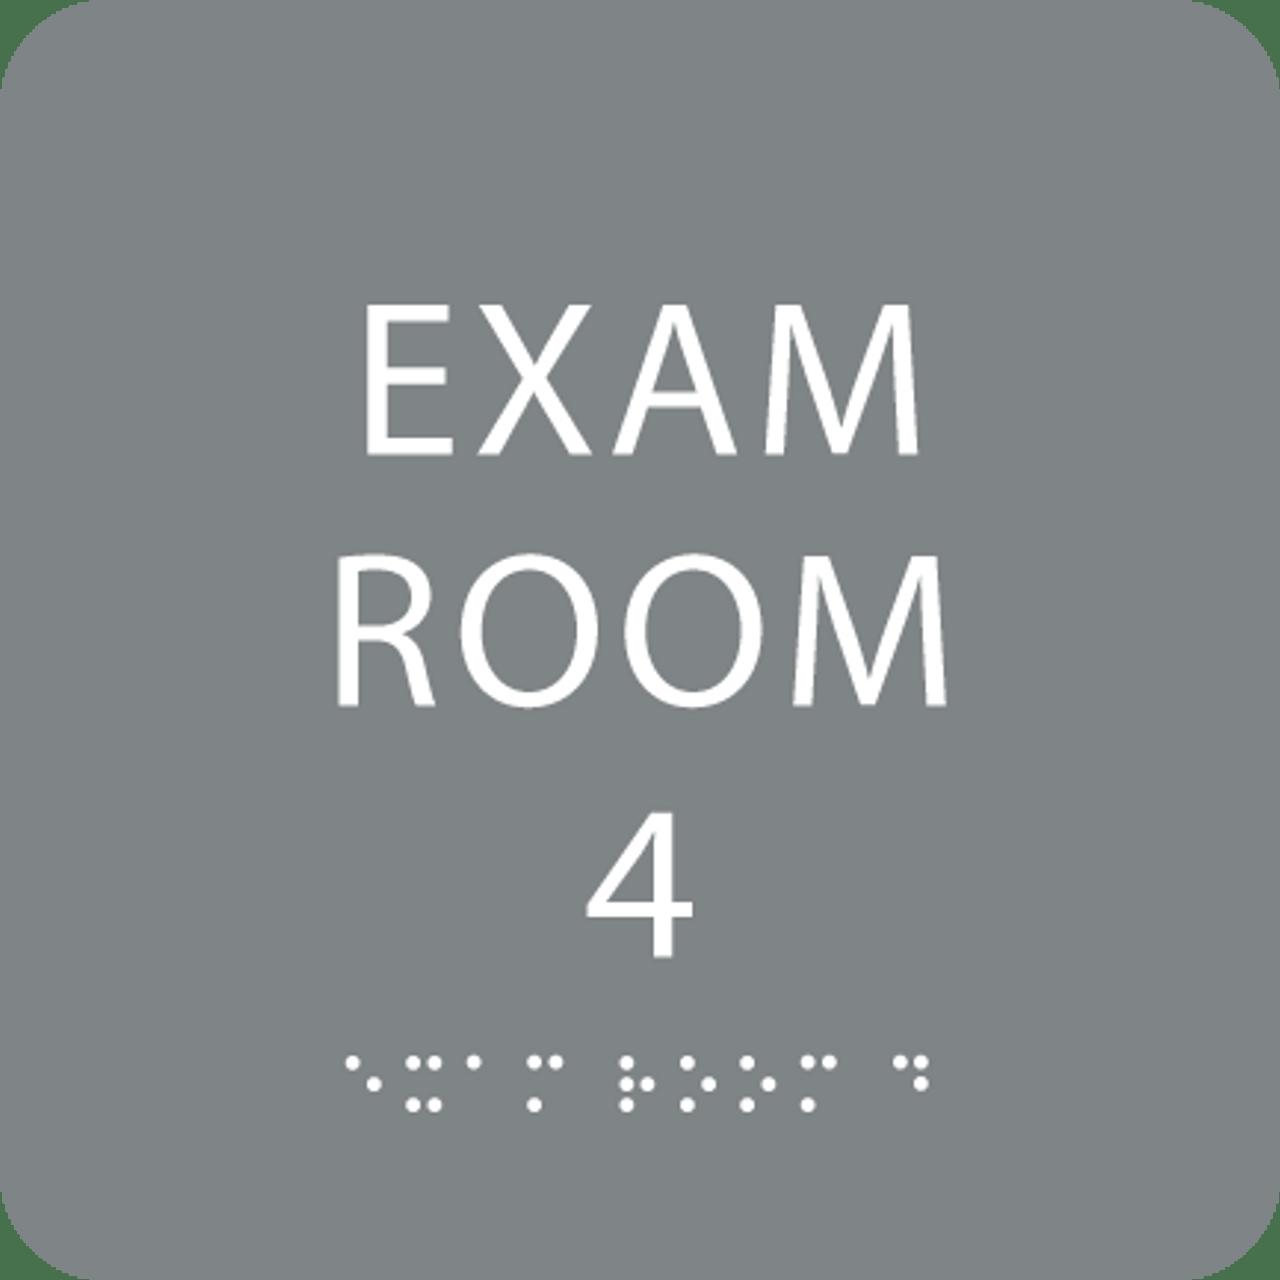 Grey Exam Room 4 ADA Sign